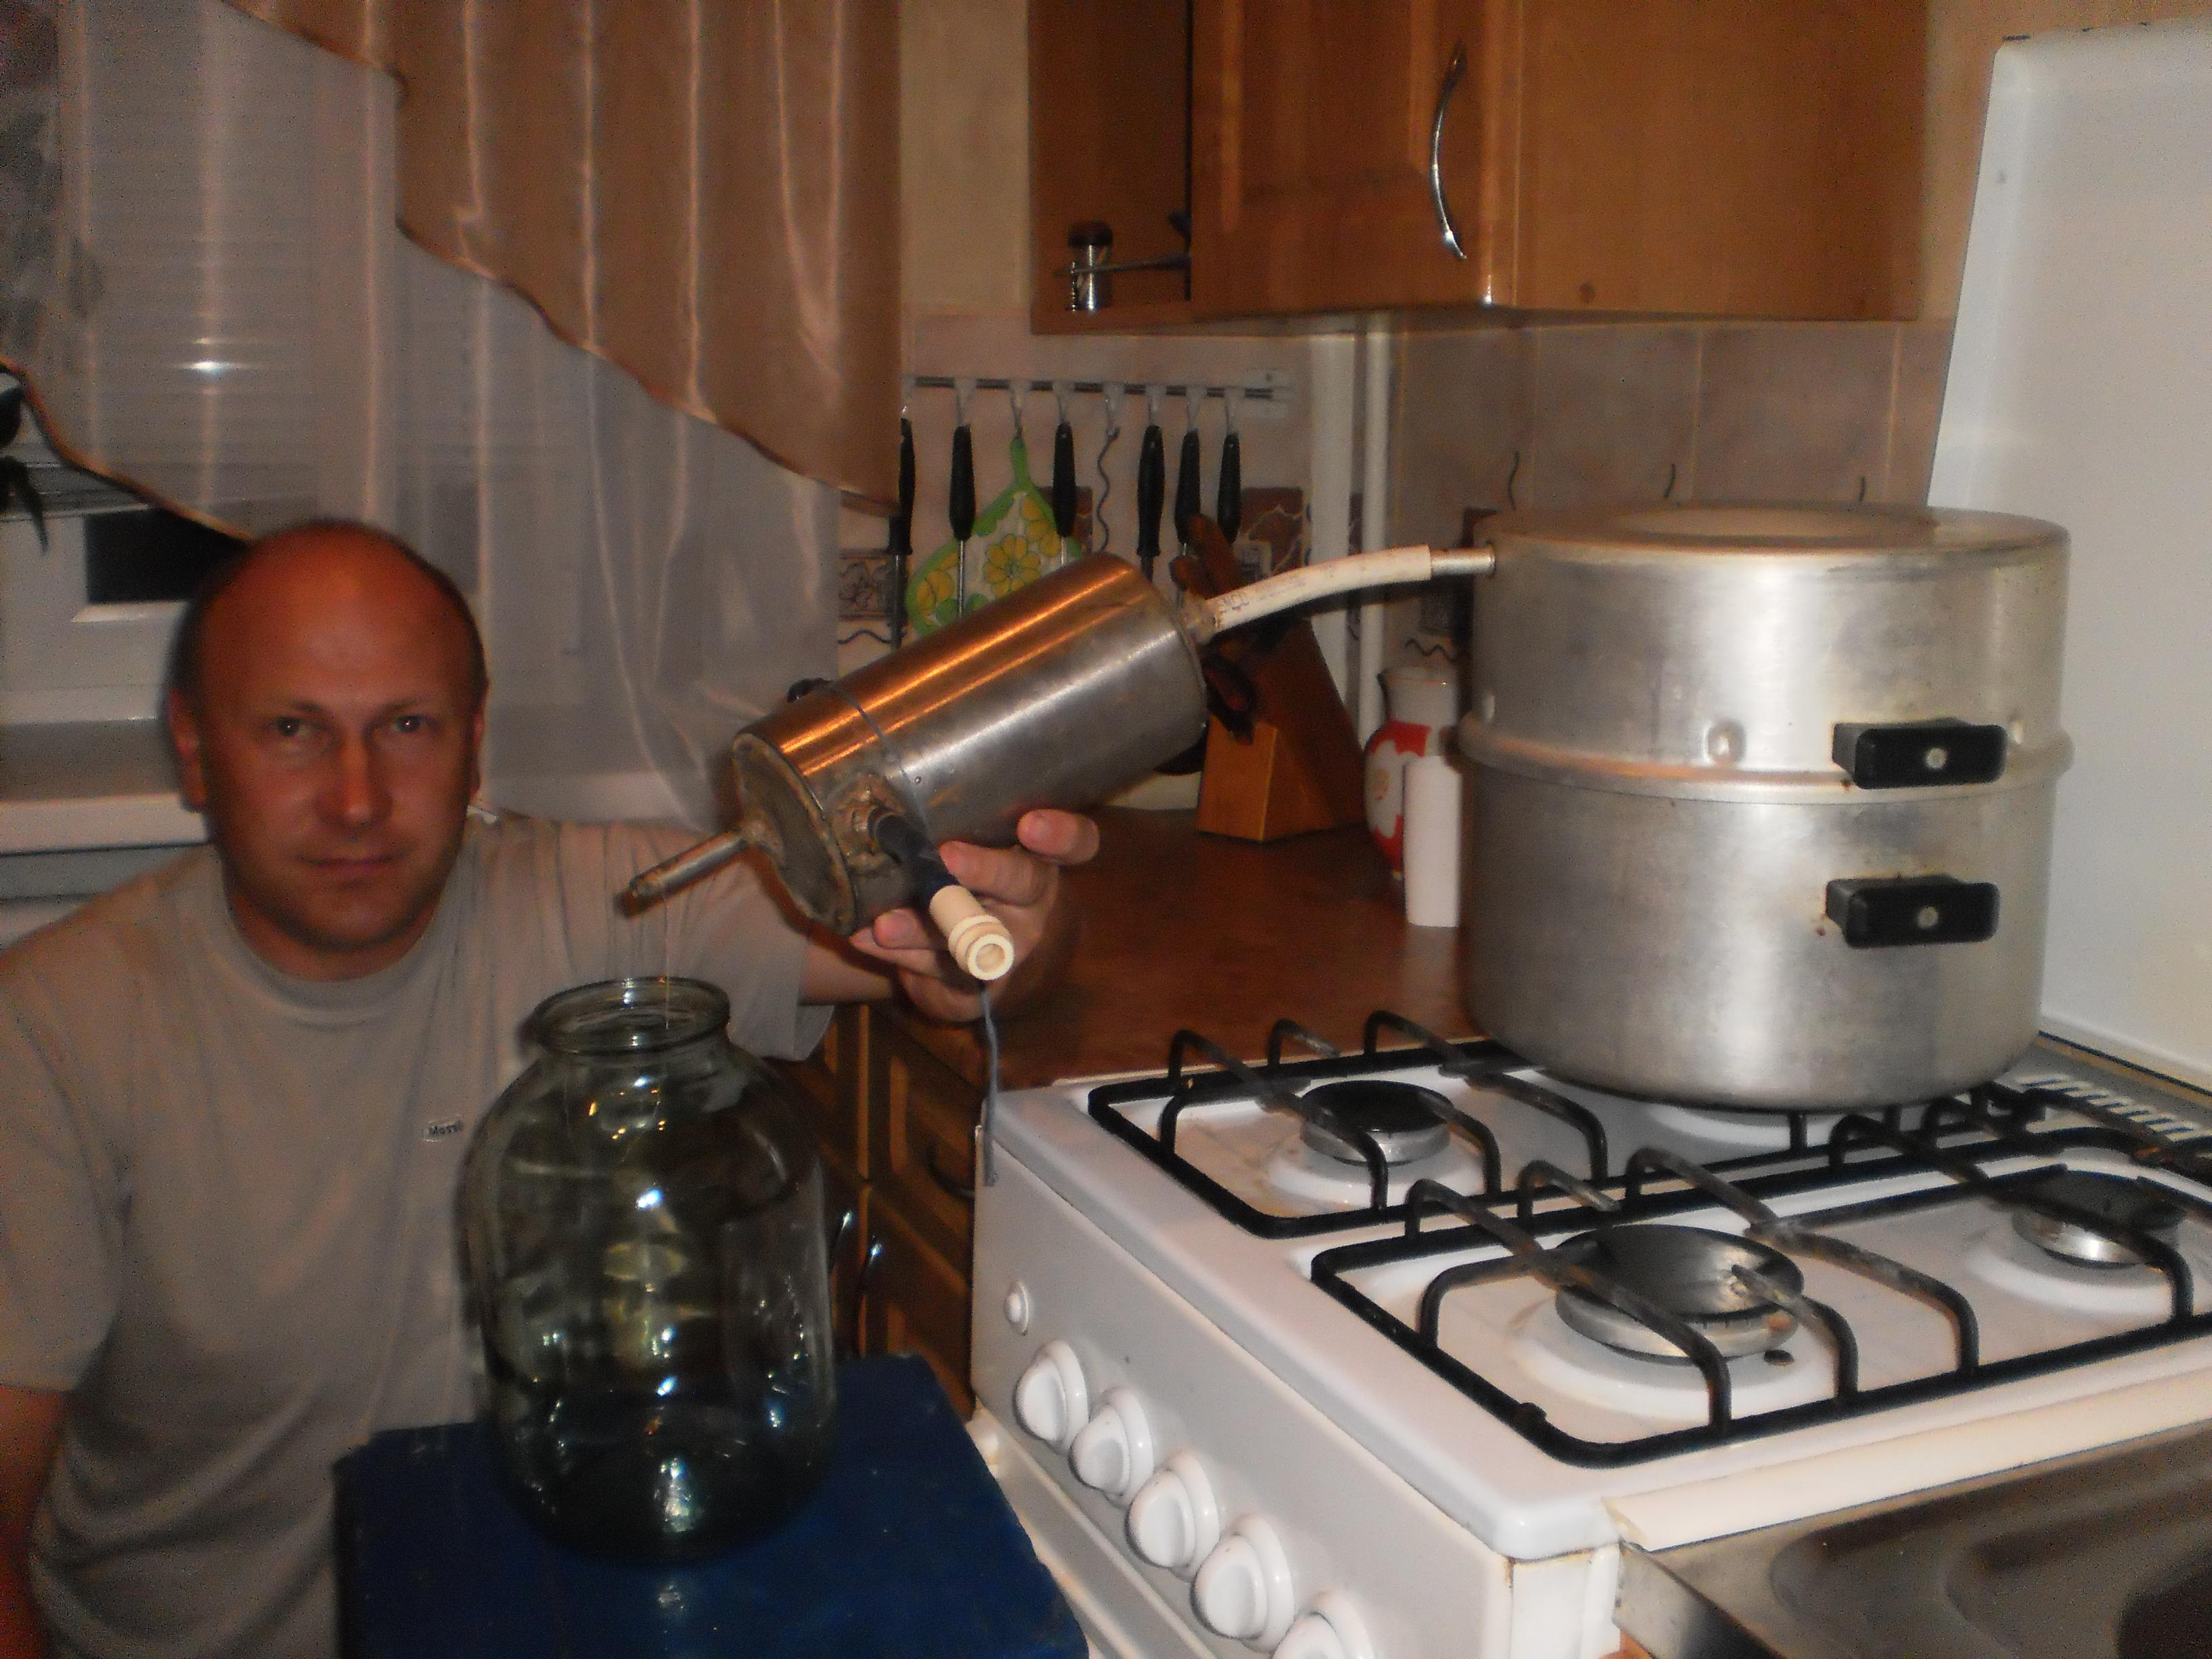 видео изготовления самогонного аппарата